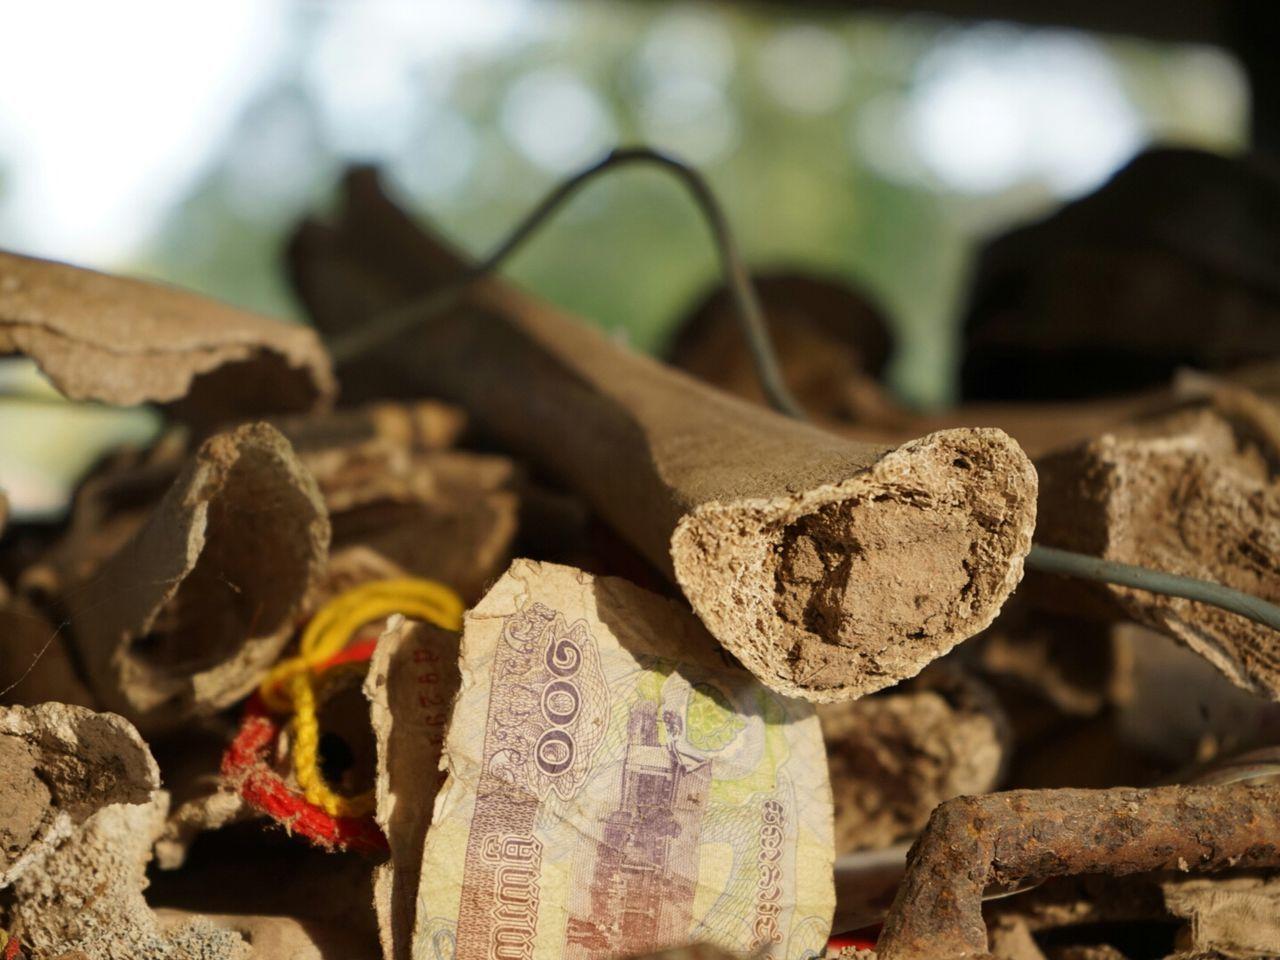 The Killing Fields Bones & Money C.s.i Asian Culture RePicture Travel